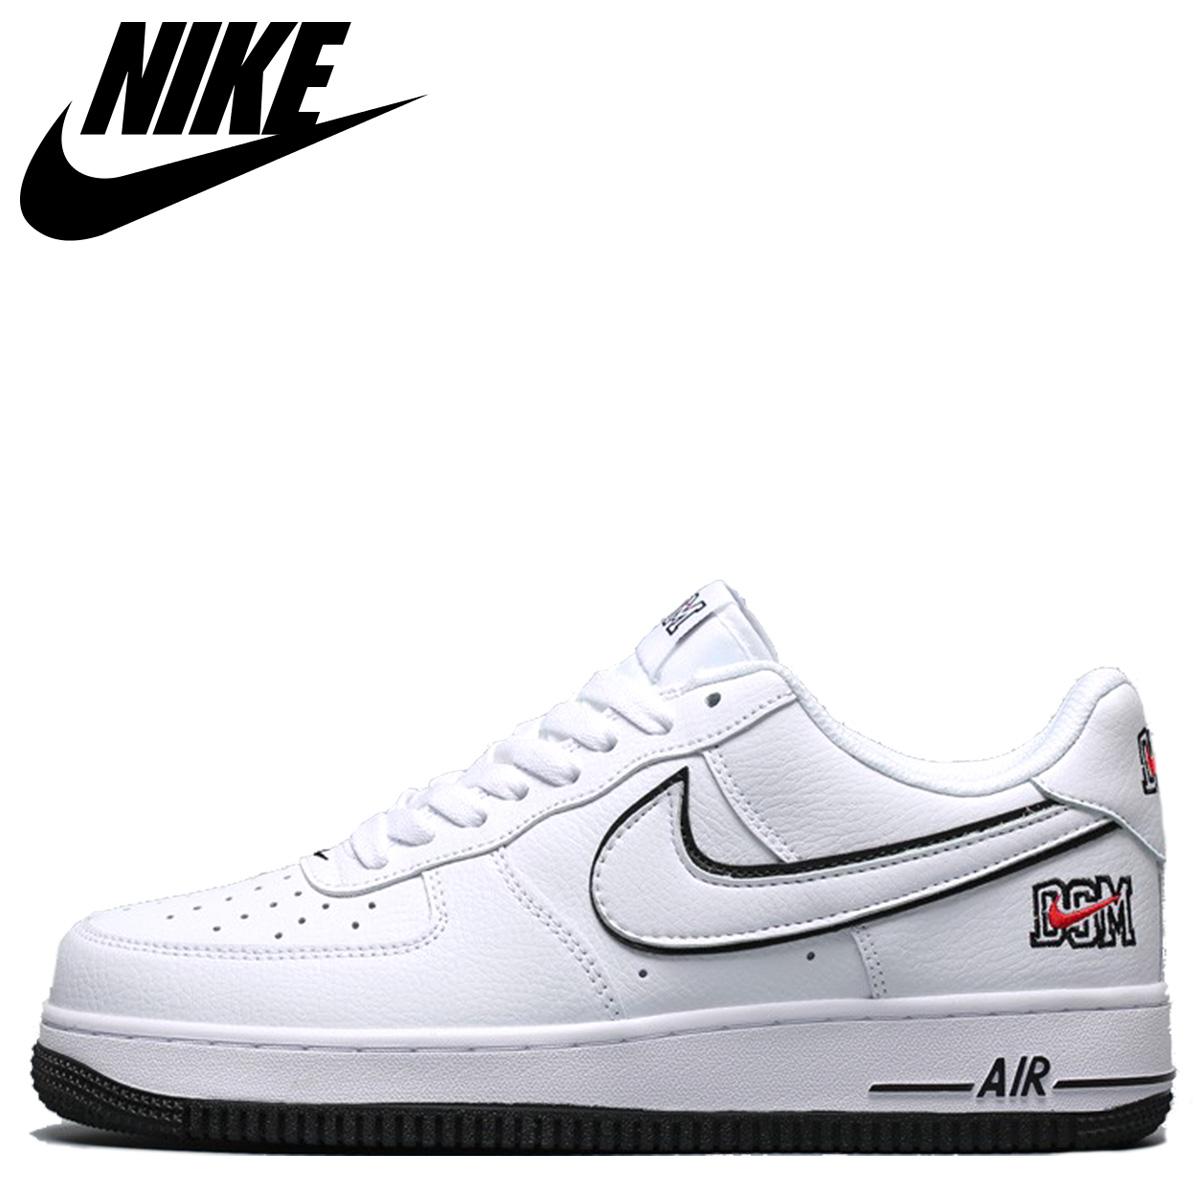 Nike NIKE air force 1 sneakers men AIR FORCE 1 LOW RETRO DSM white white CD6150 113